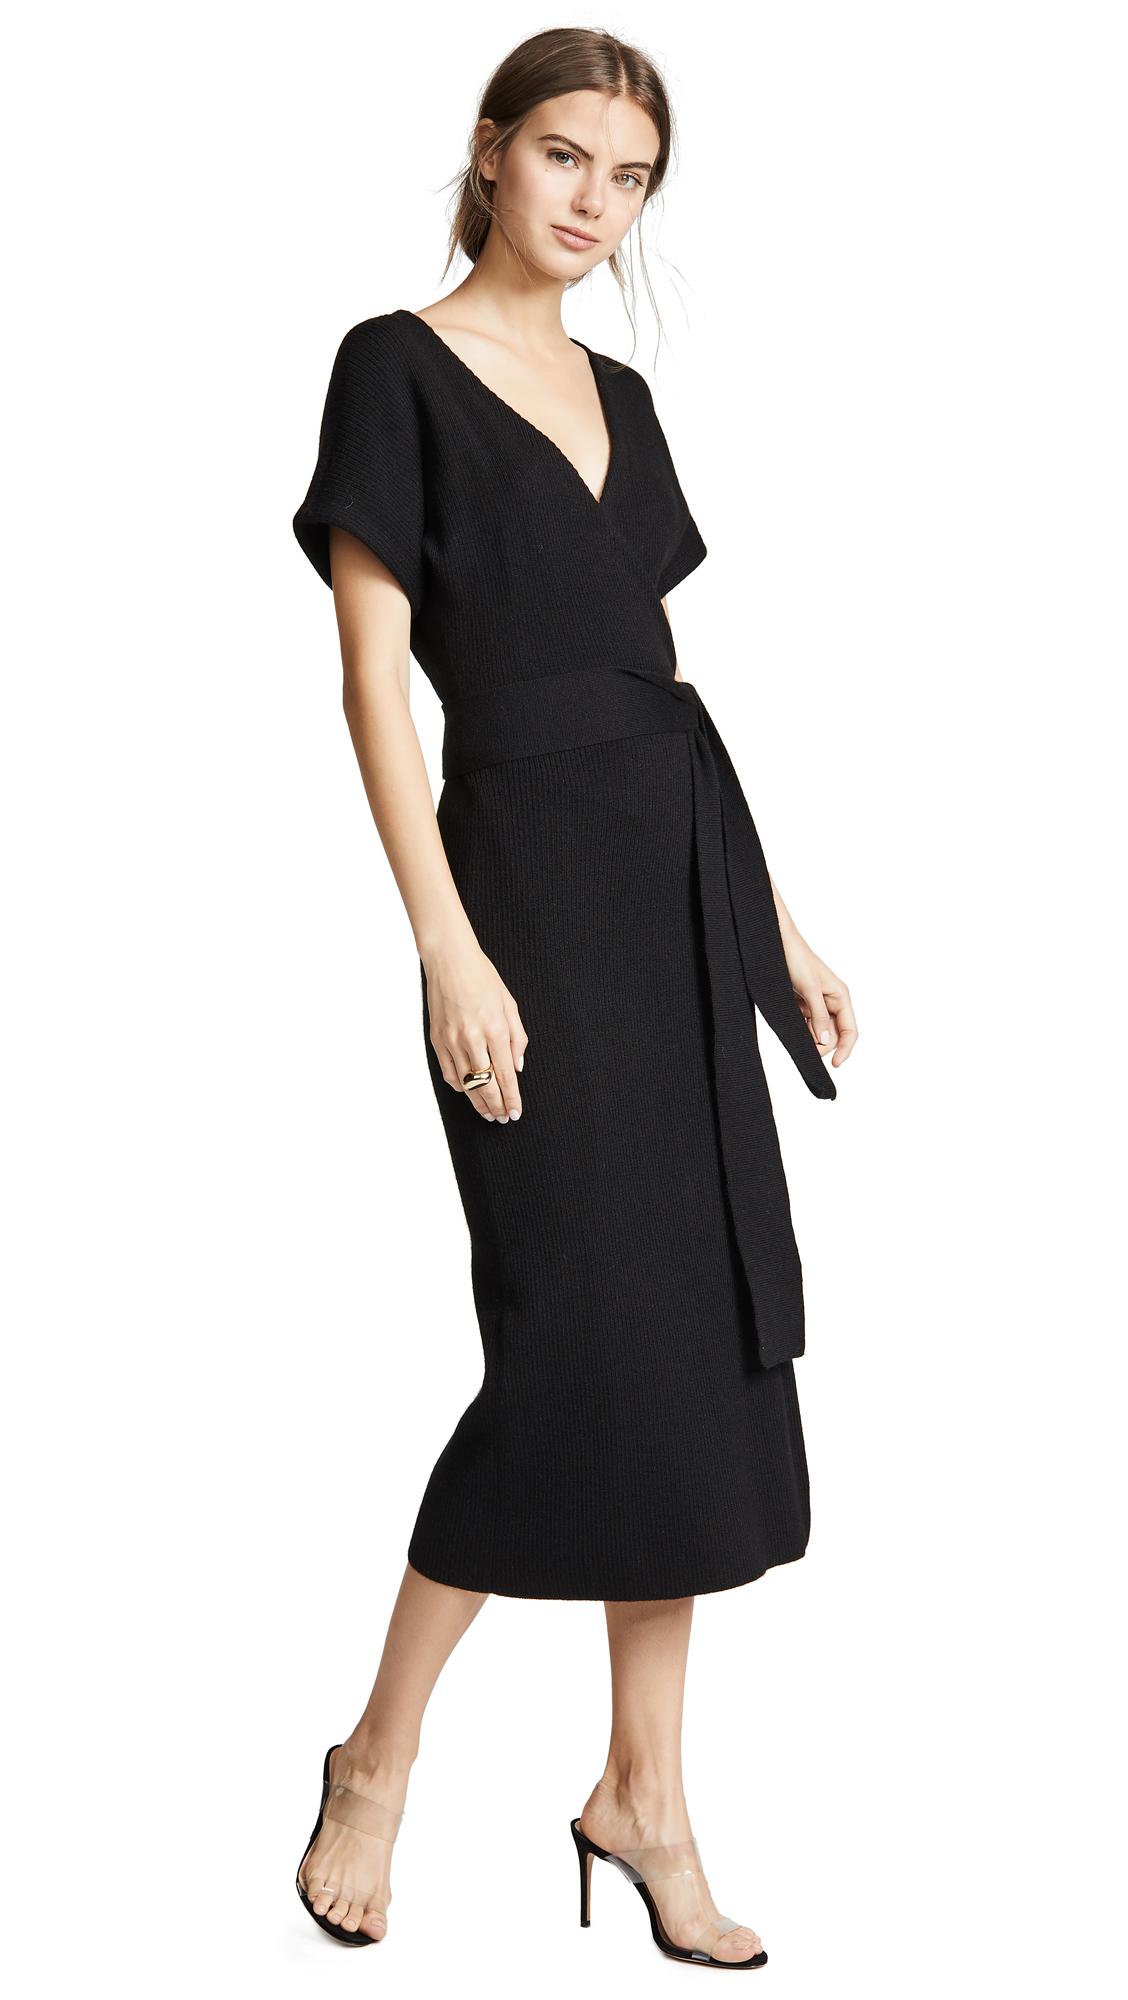 Mara Hoffman Joss Dress - Black